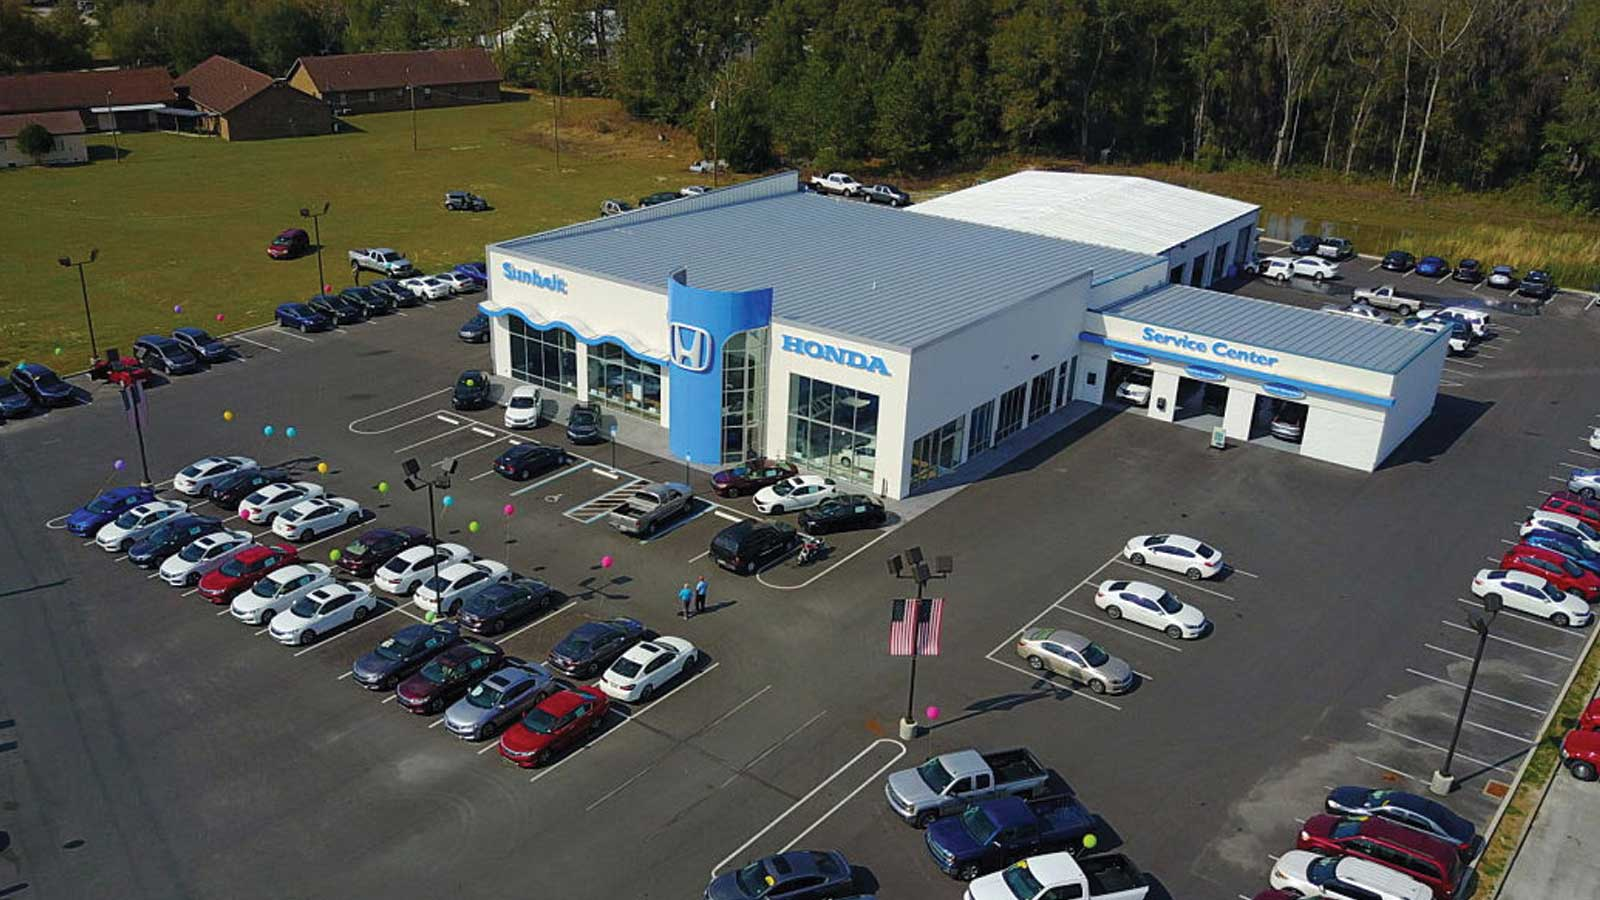 North Florida Professional Services